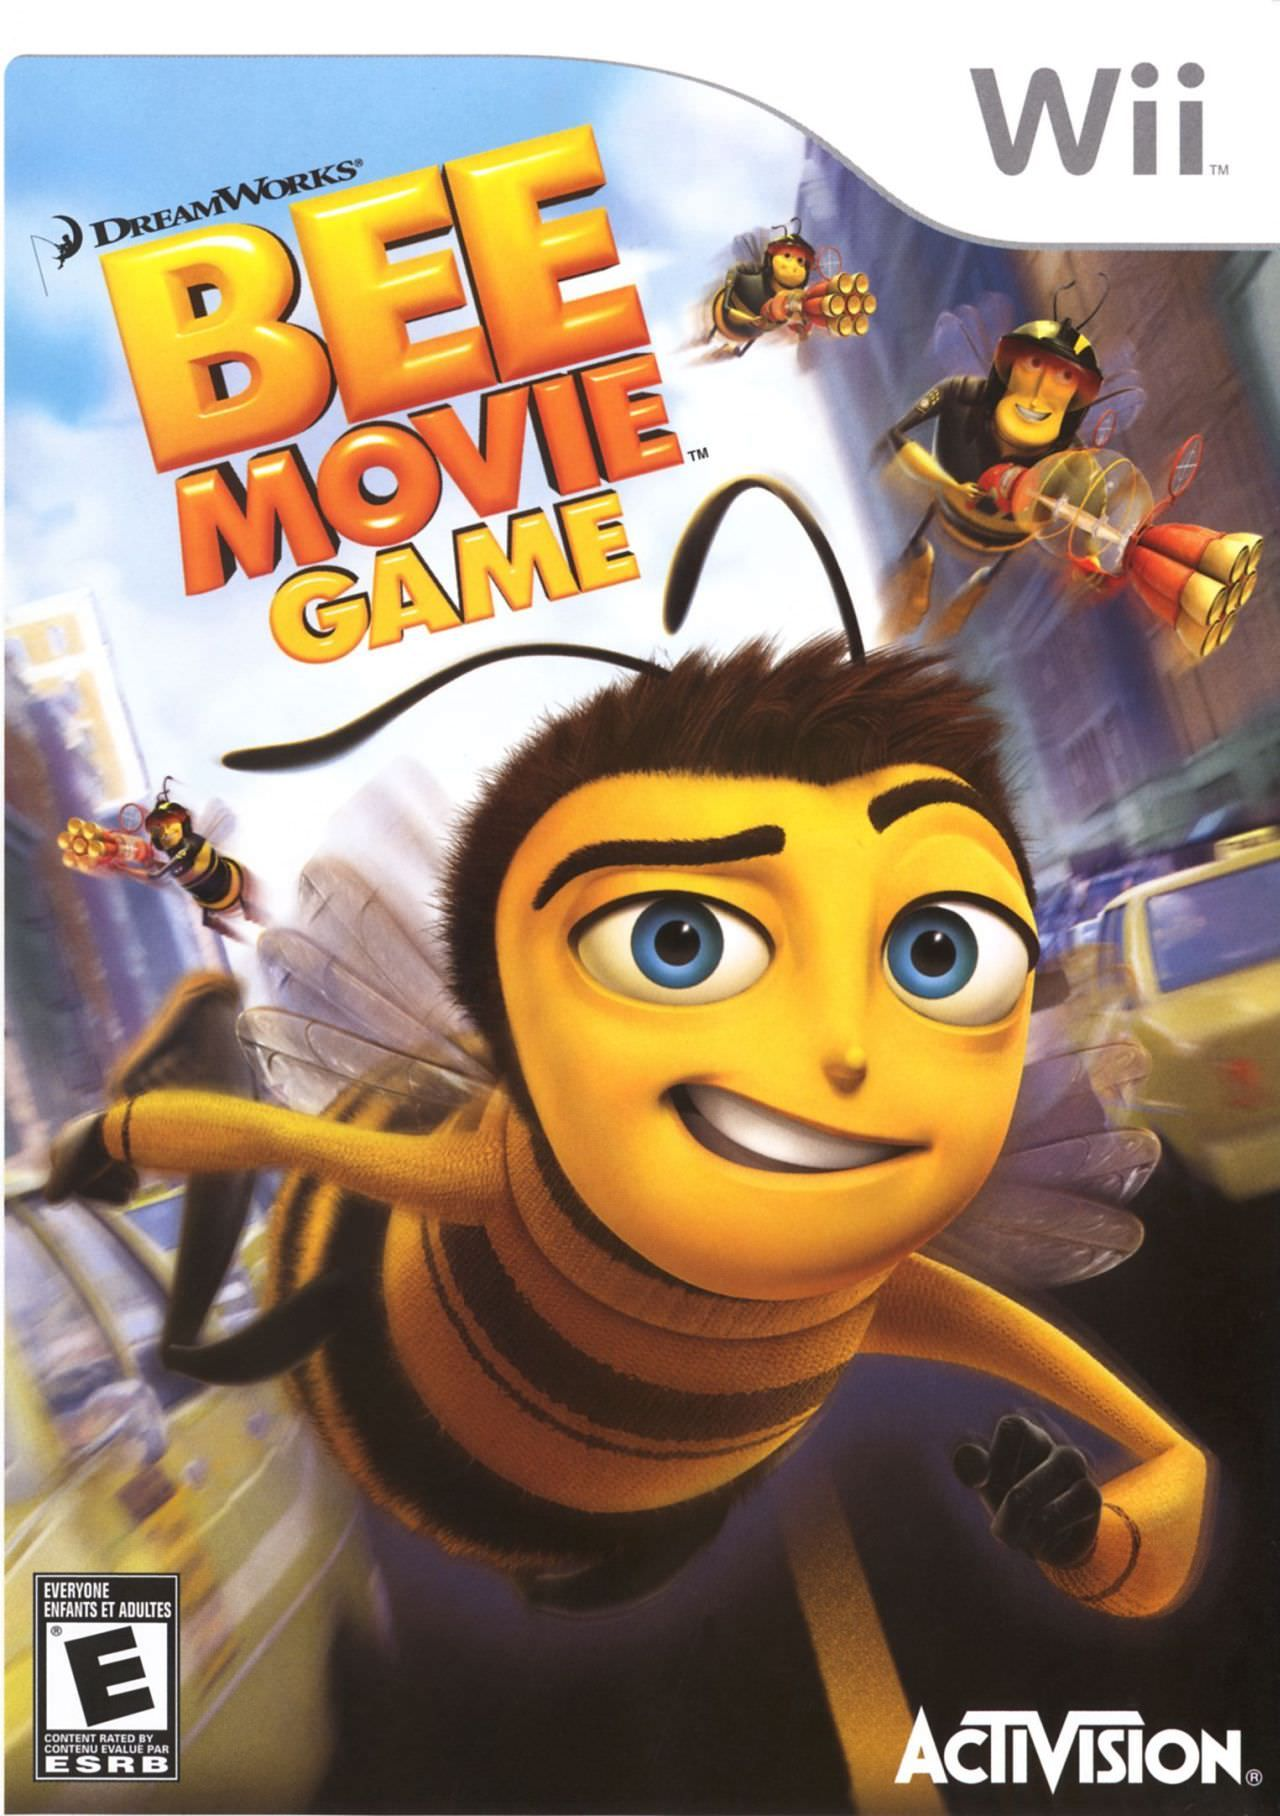 Pin By Aaron Viles On Nintendo Bee Movie Game Bee Movie Movie Game